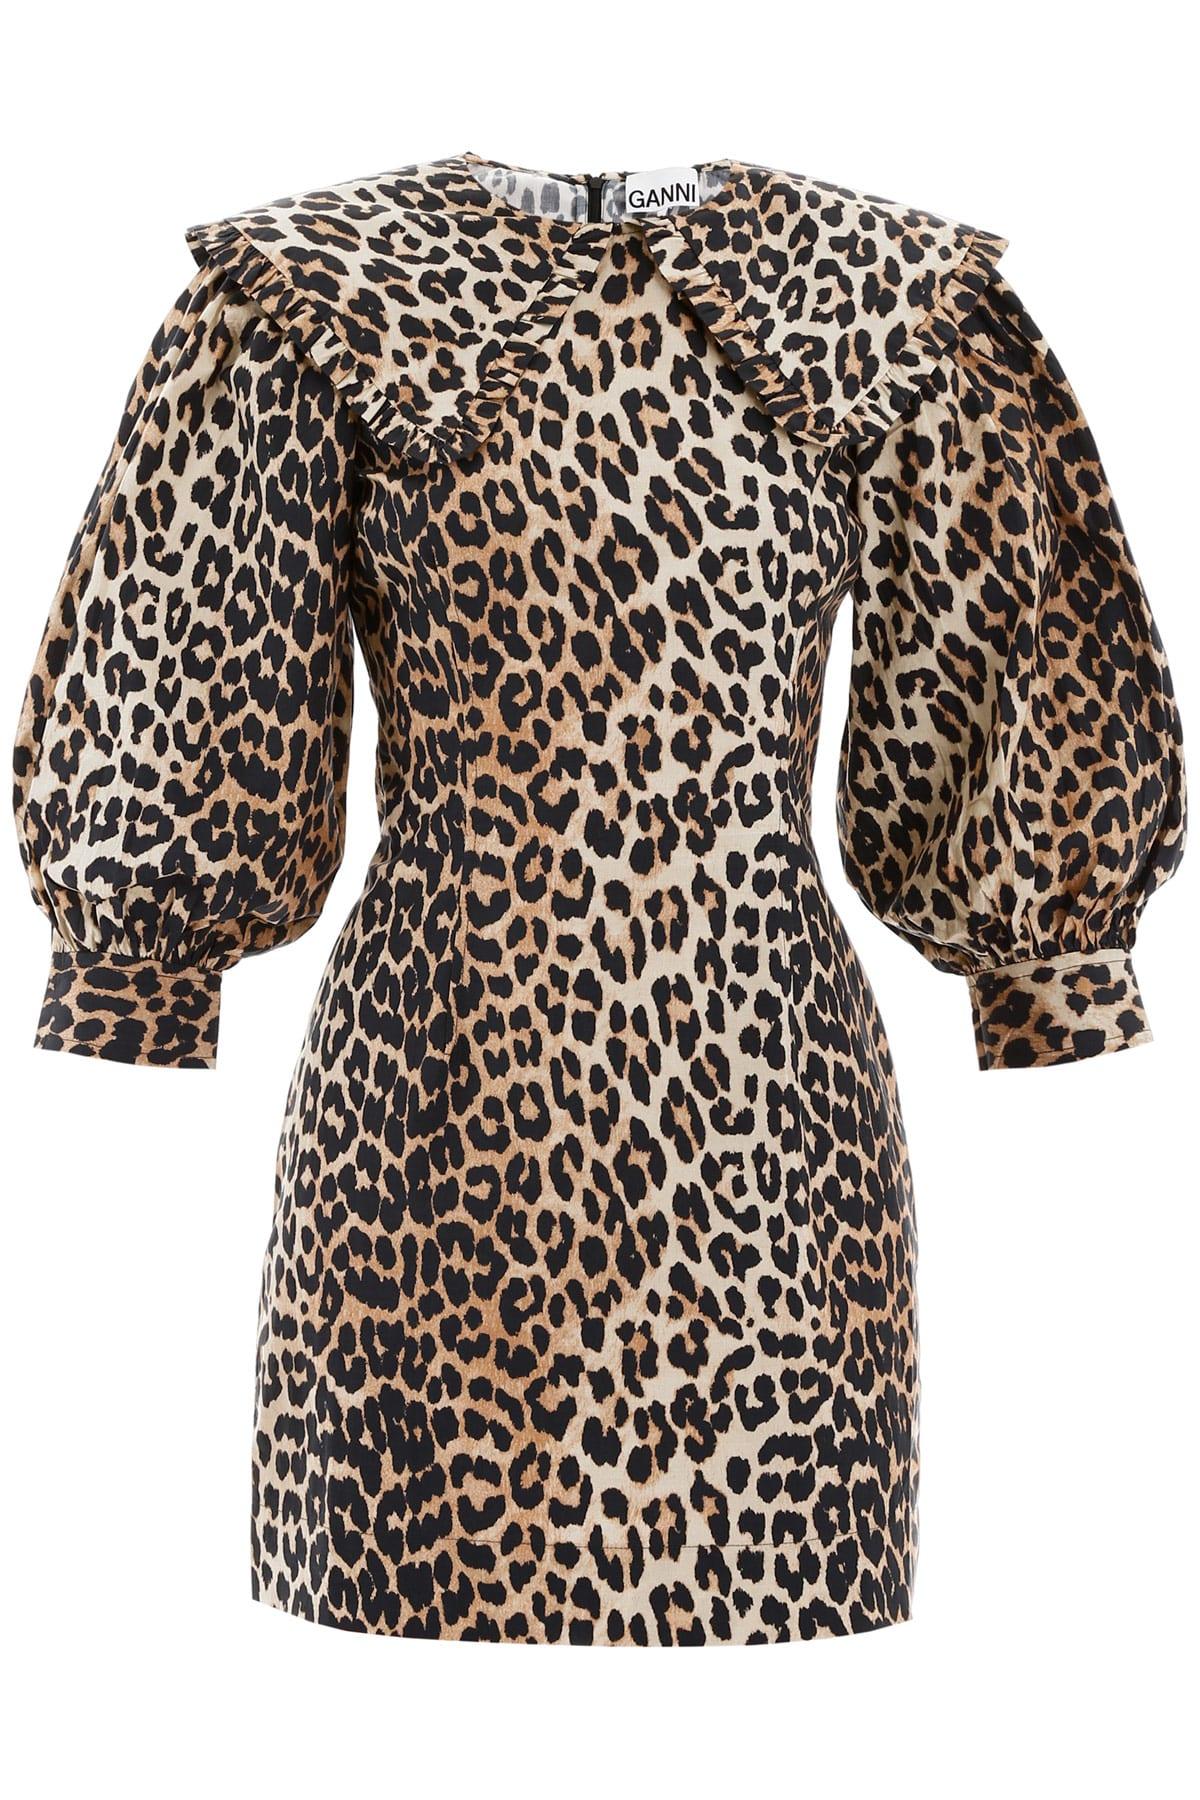 Buy Ganni Animal Print Mini Dress online, shop Ganni with free shipping